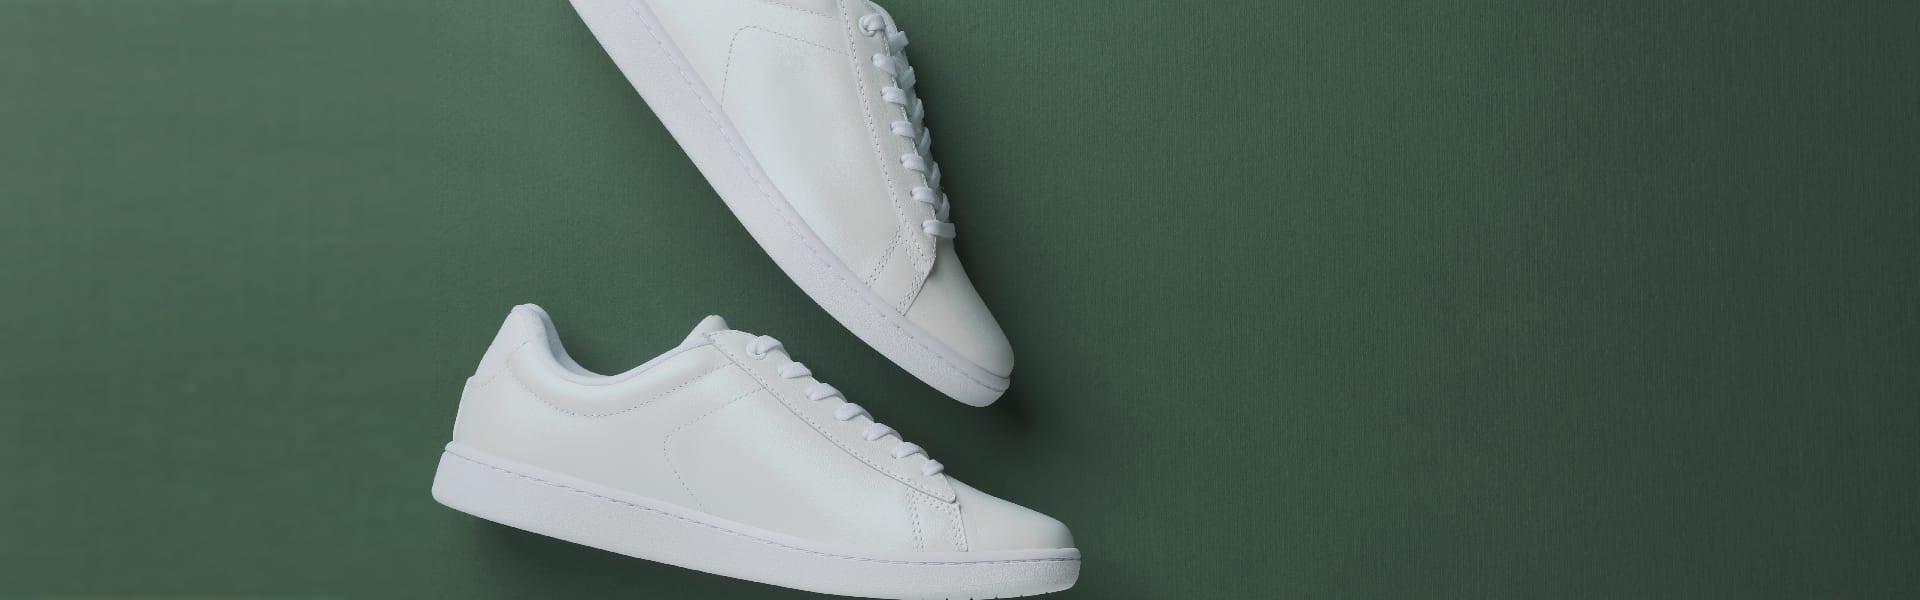 Tendances Chaussures - Mail Champlain